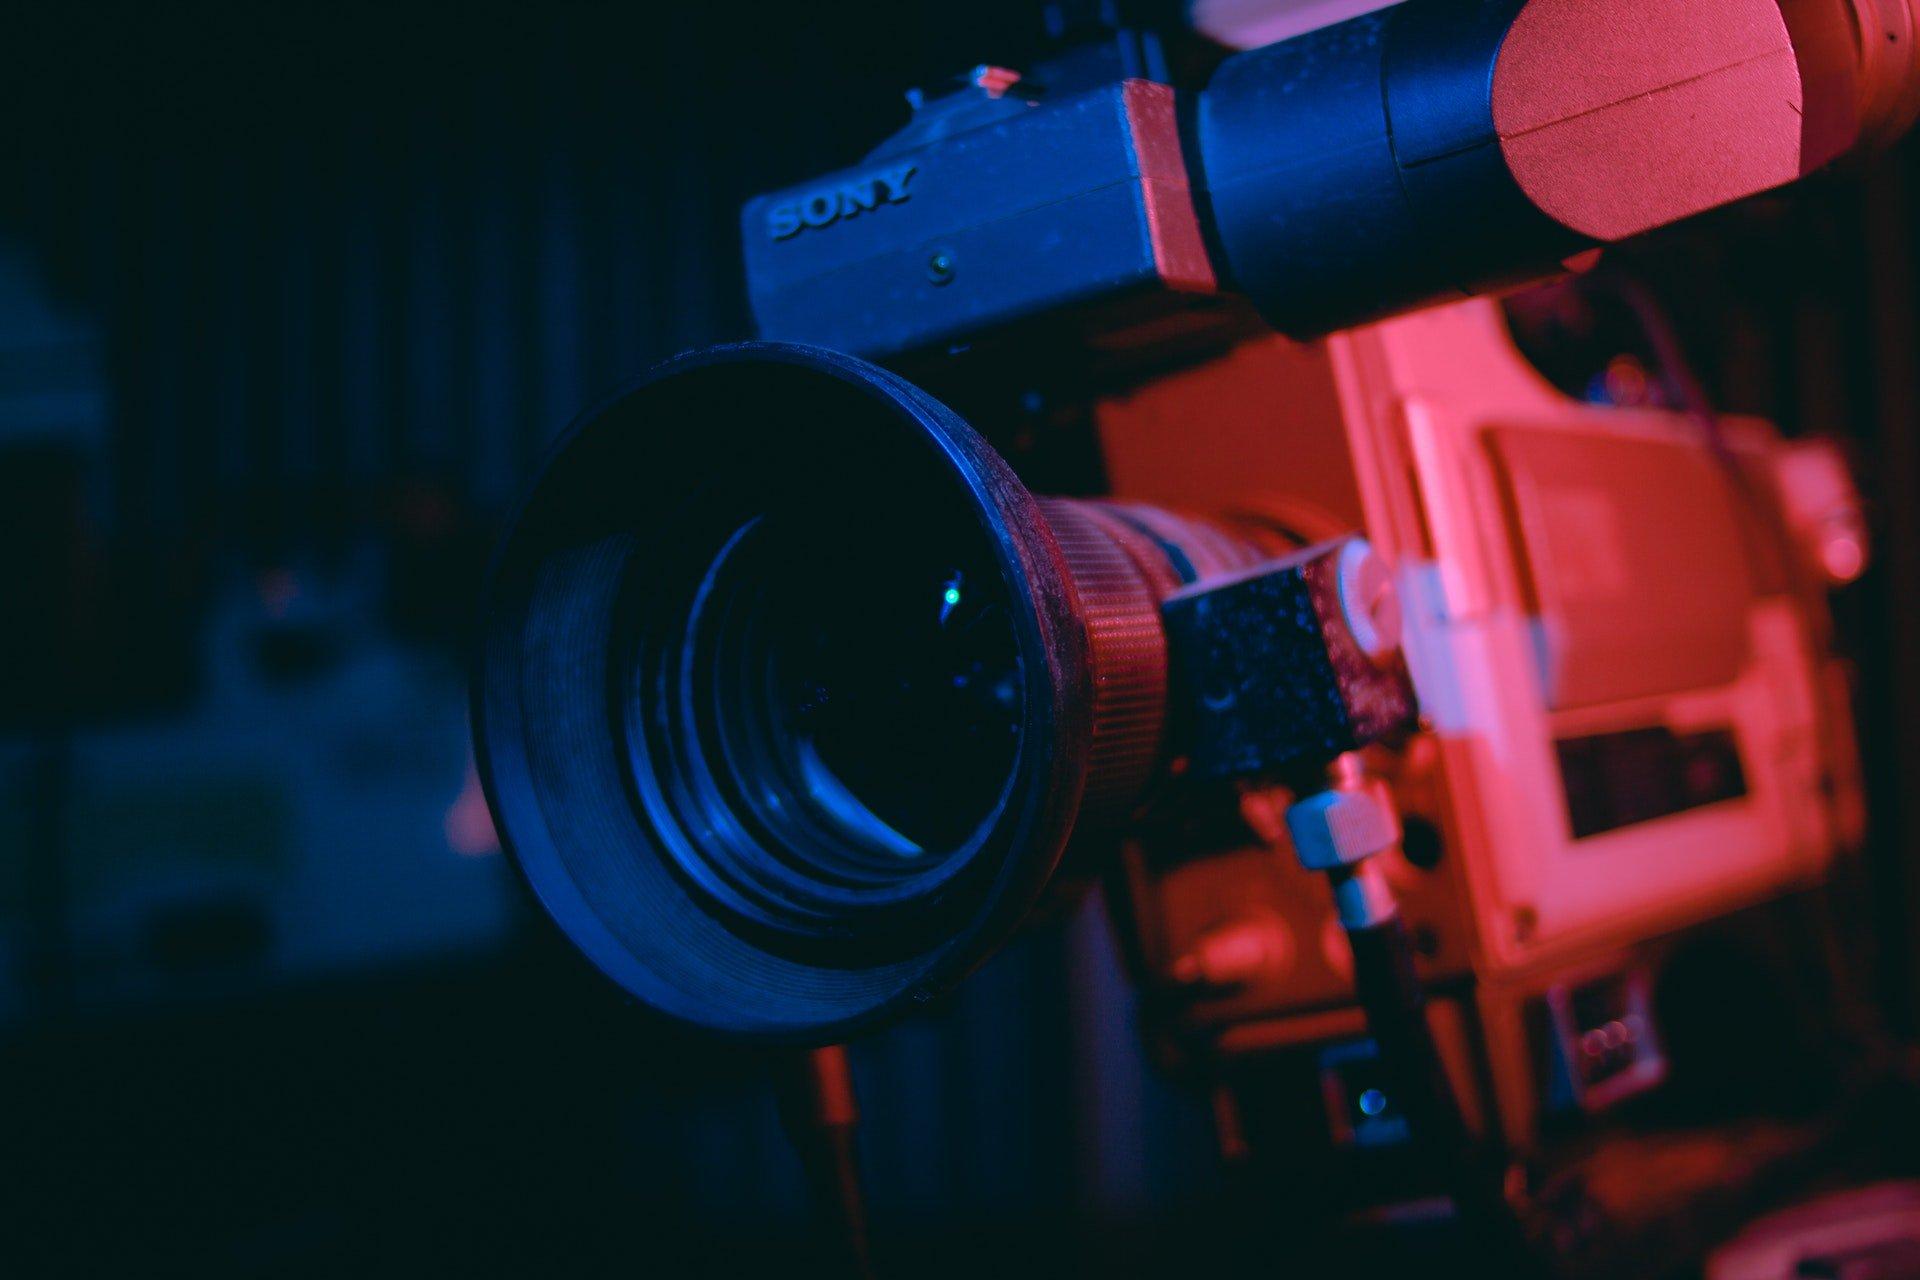 Close up of a video camera